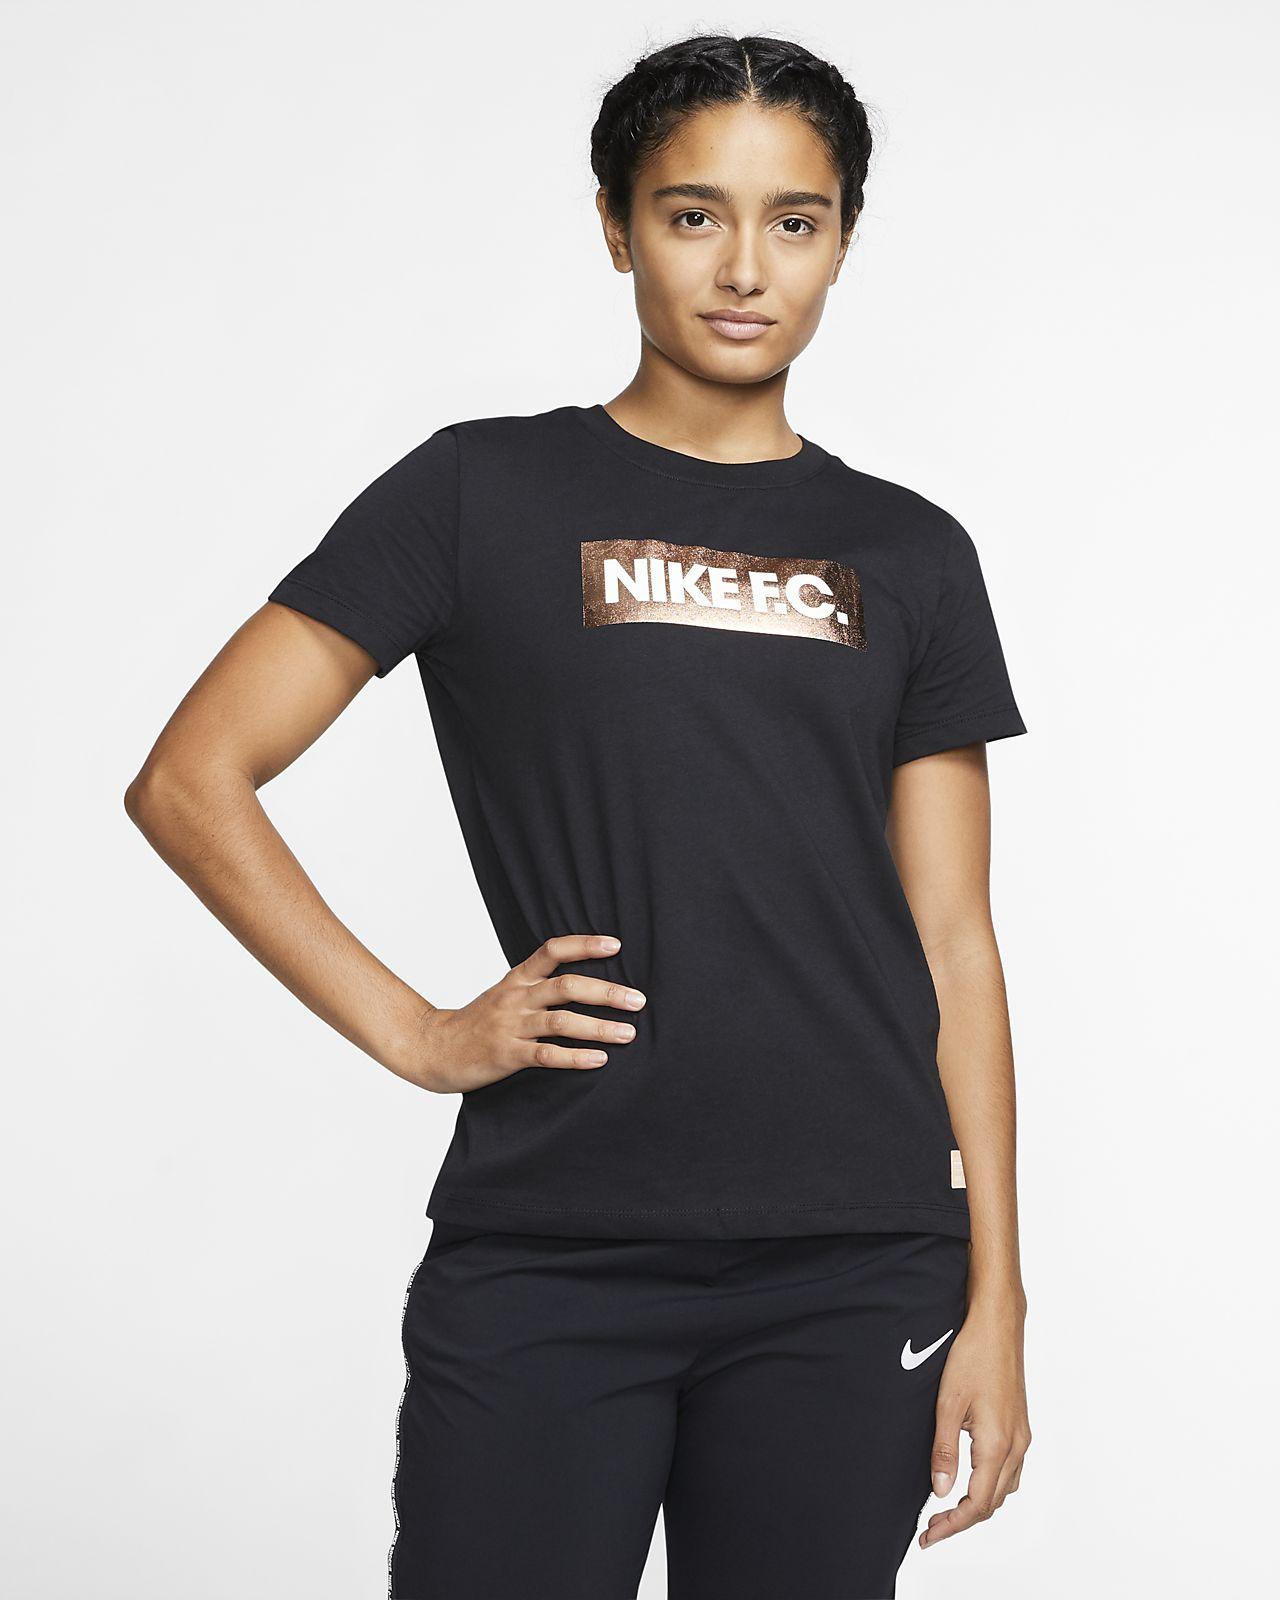 Dámské fotbalové tričko Nike F.C.